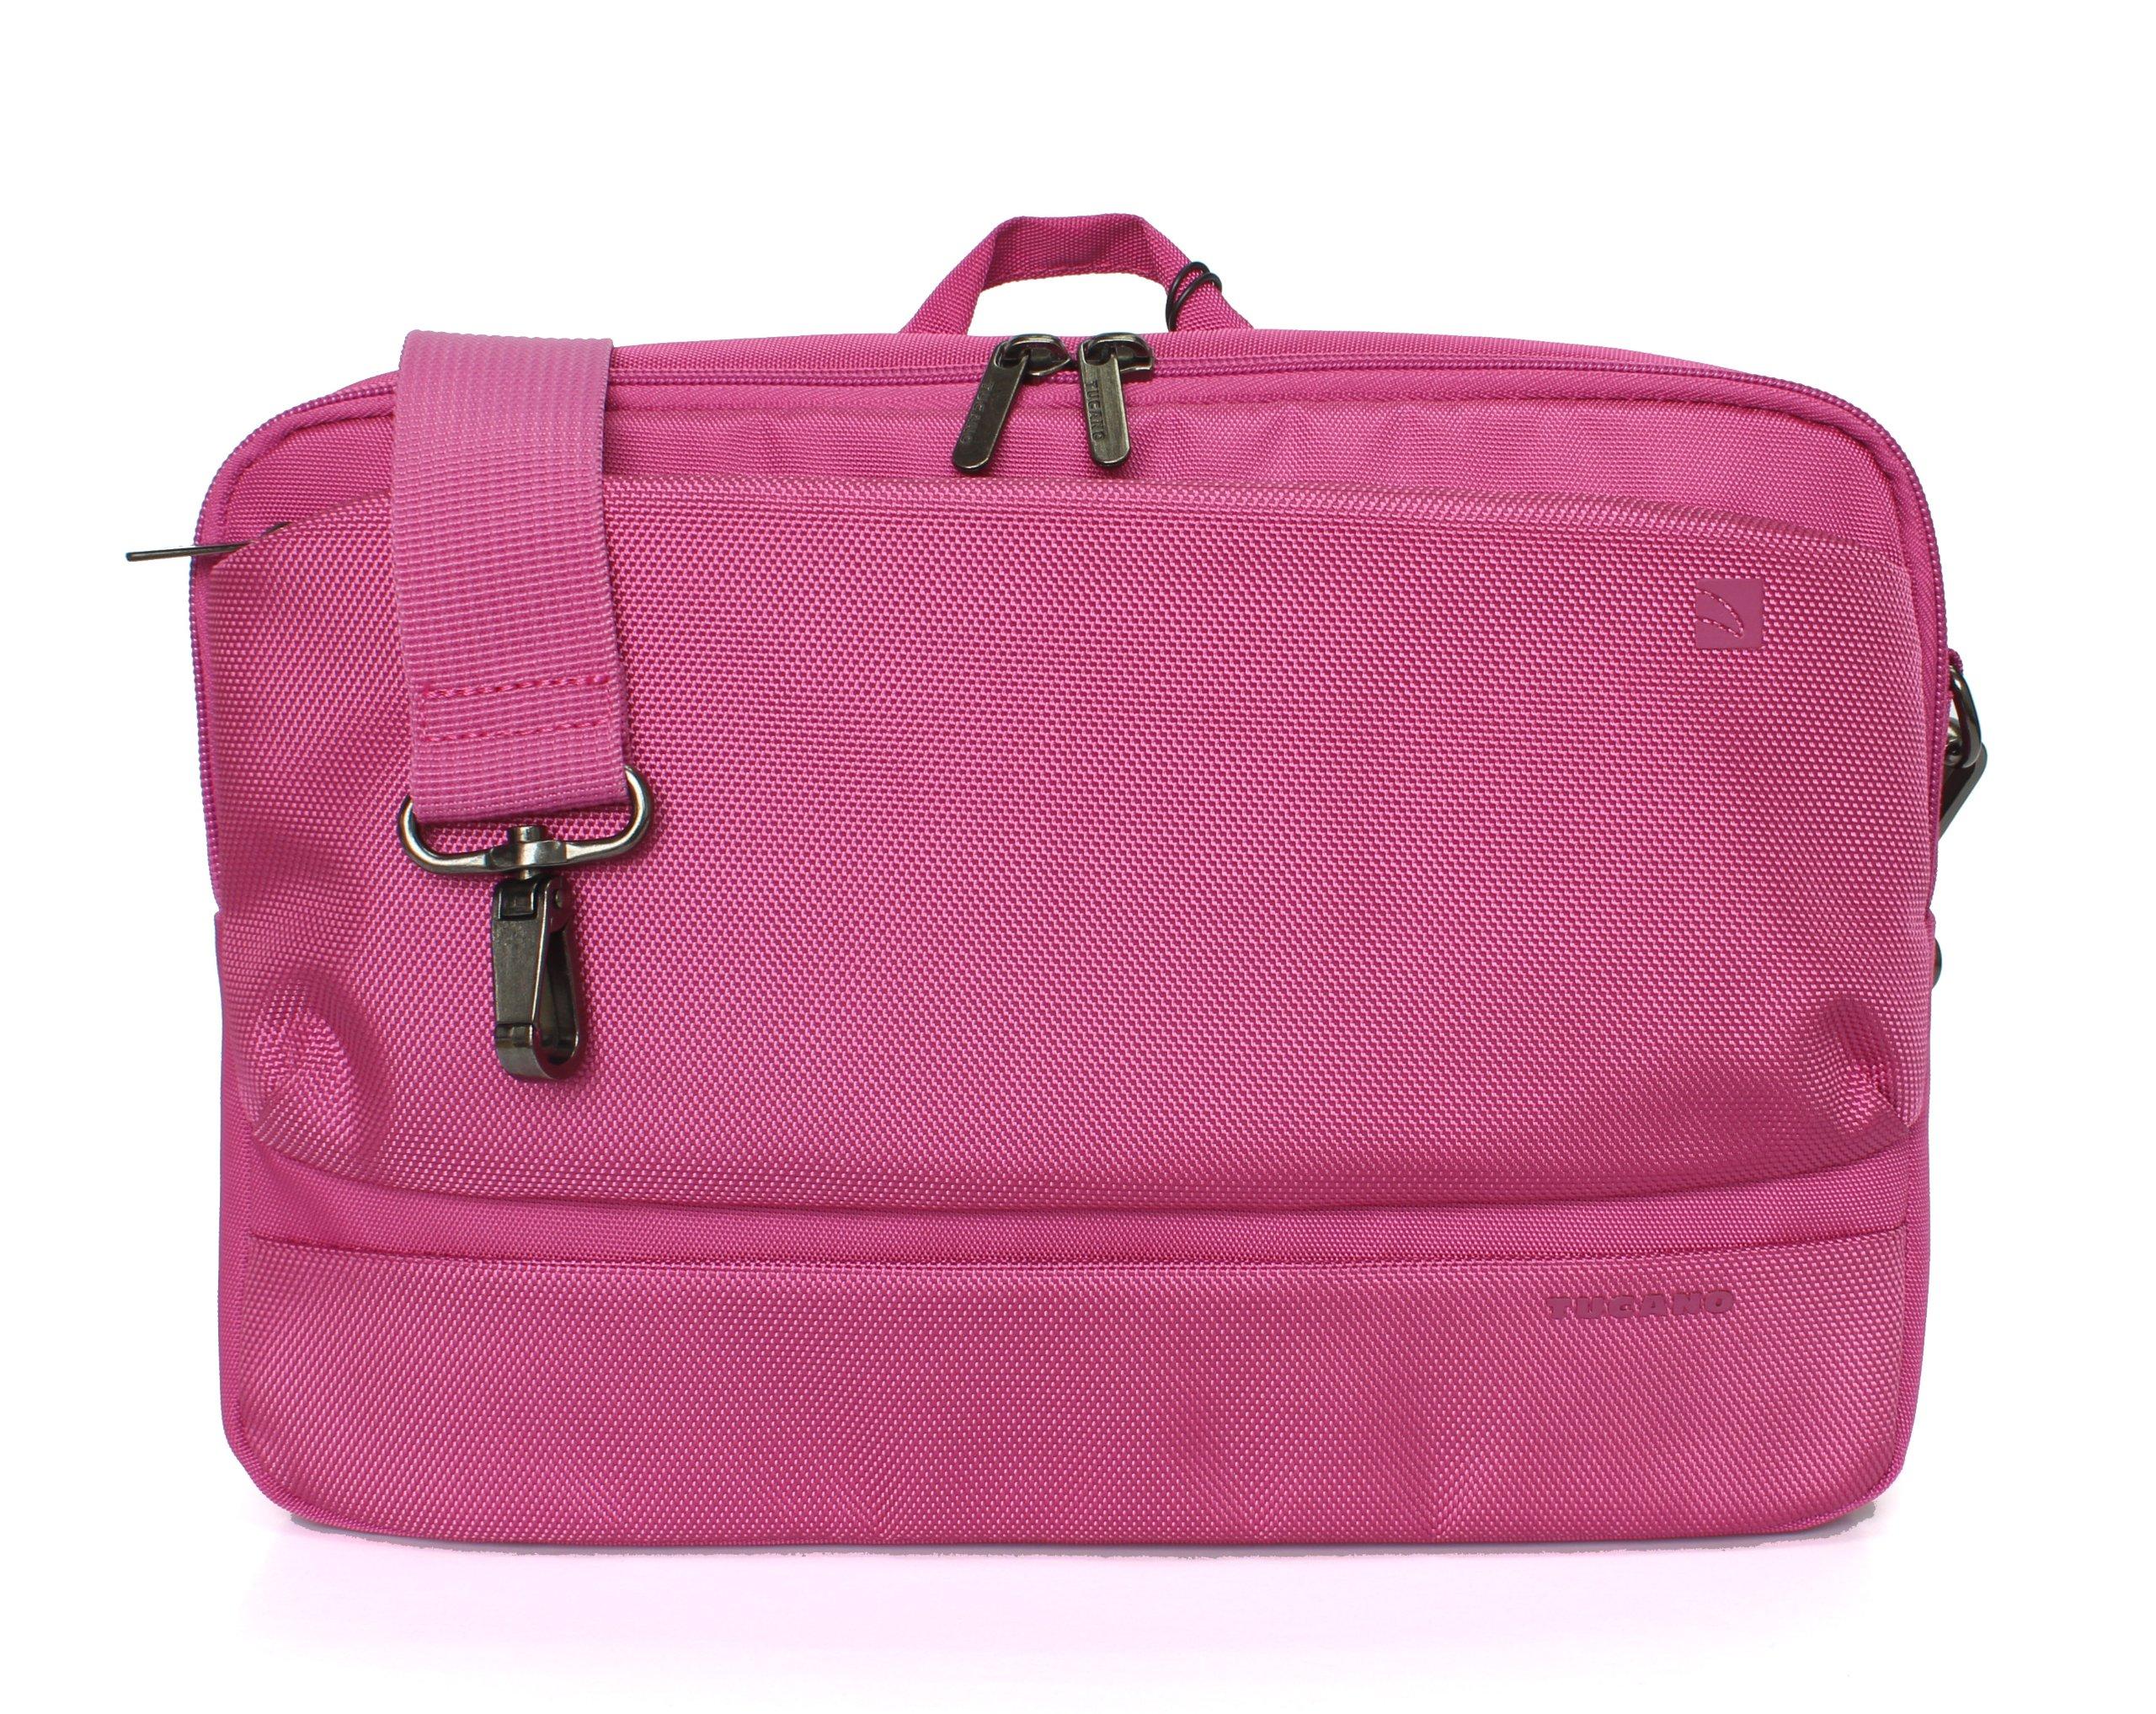 TUCANO BDR11-F Laptop Computer Bags & Cases